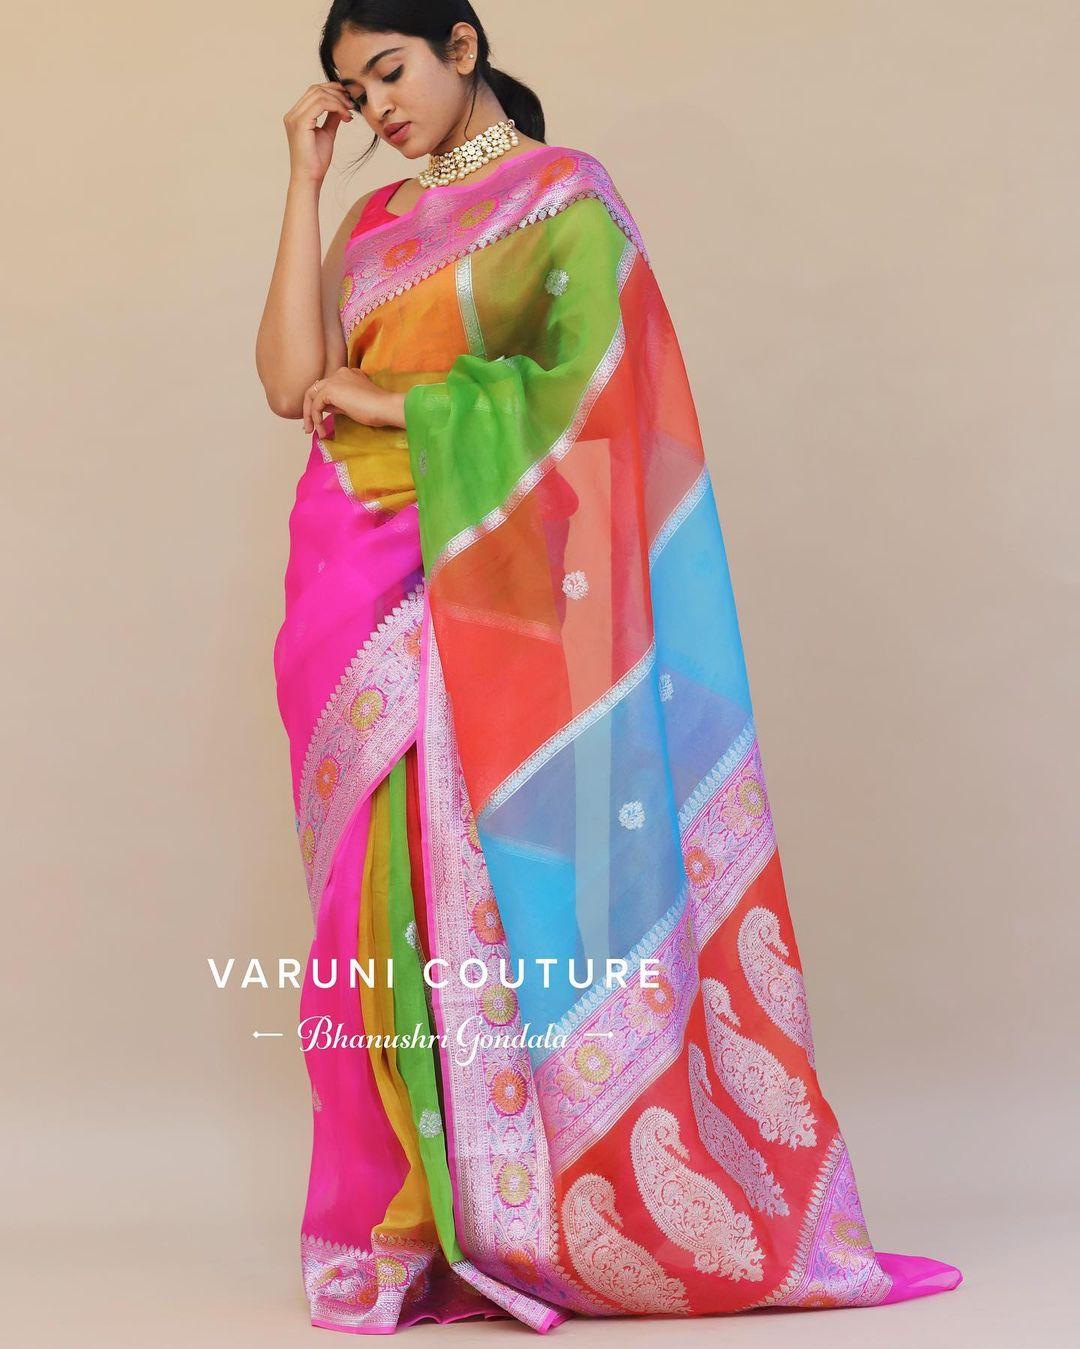 Powerful feminine allure . One of hot favourites in organza saree. 2021-09-24